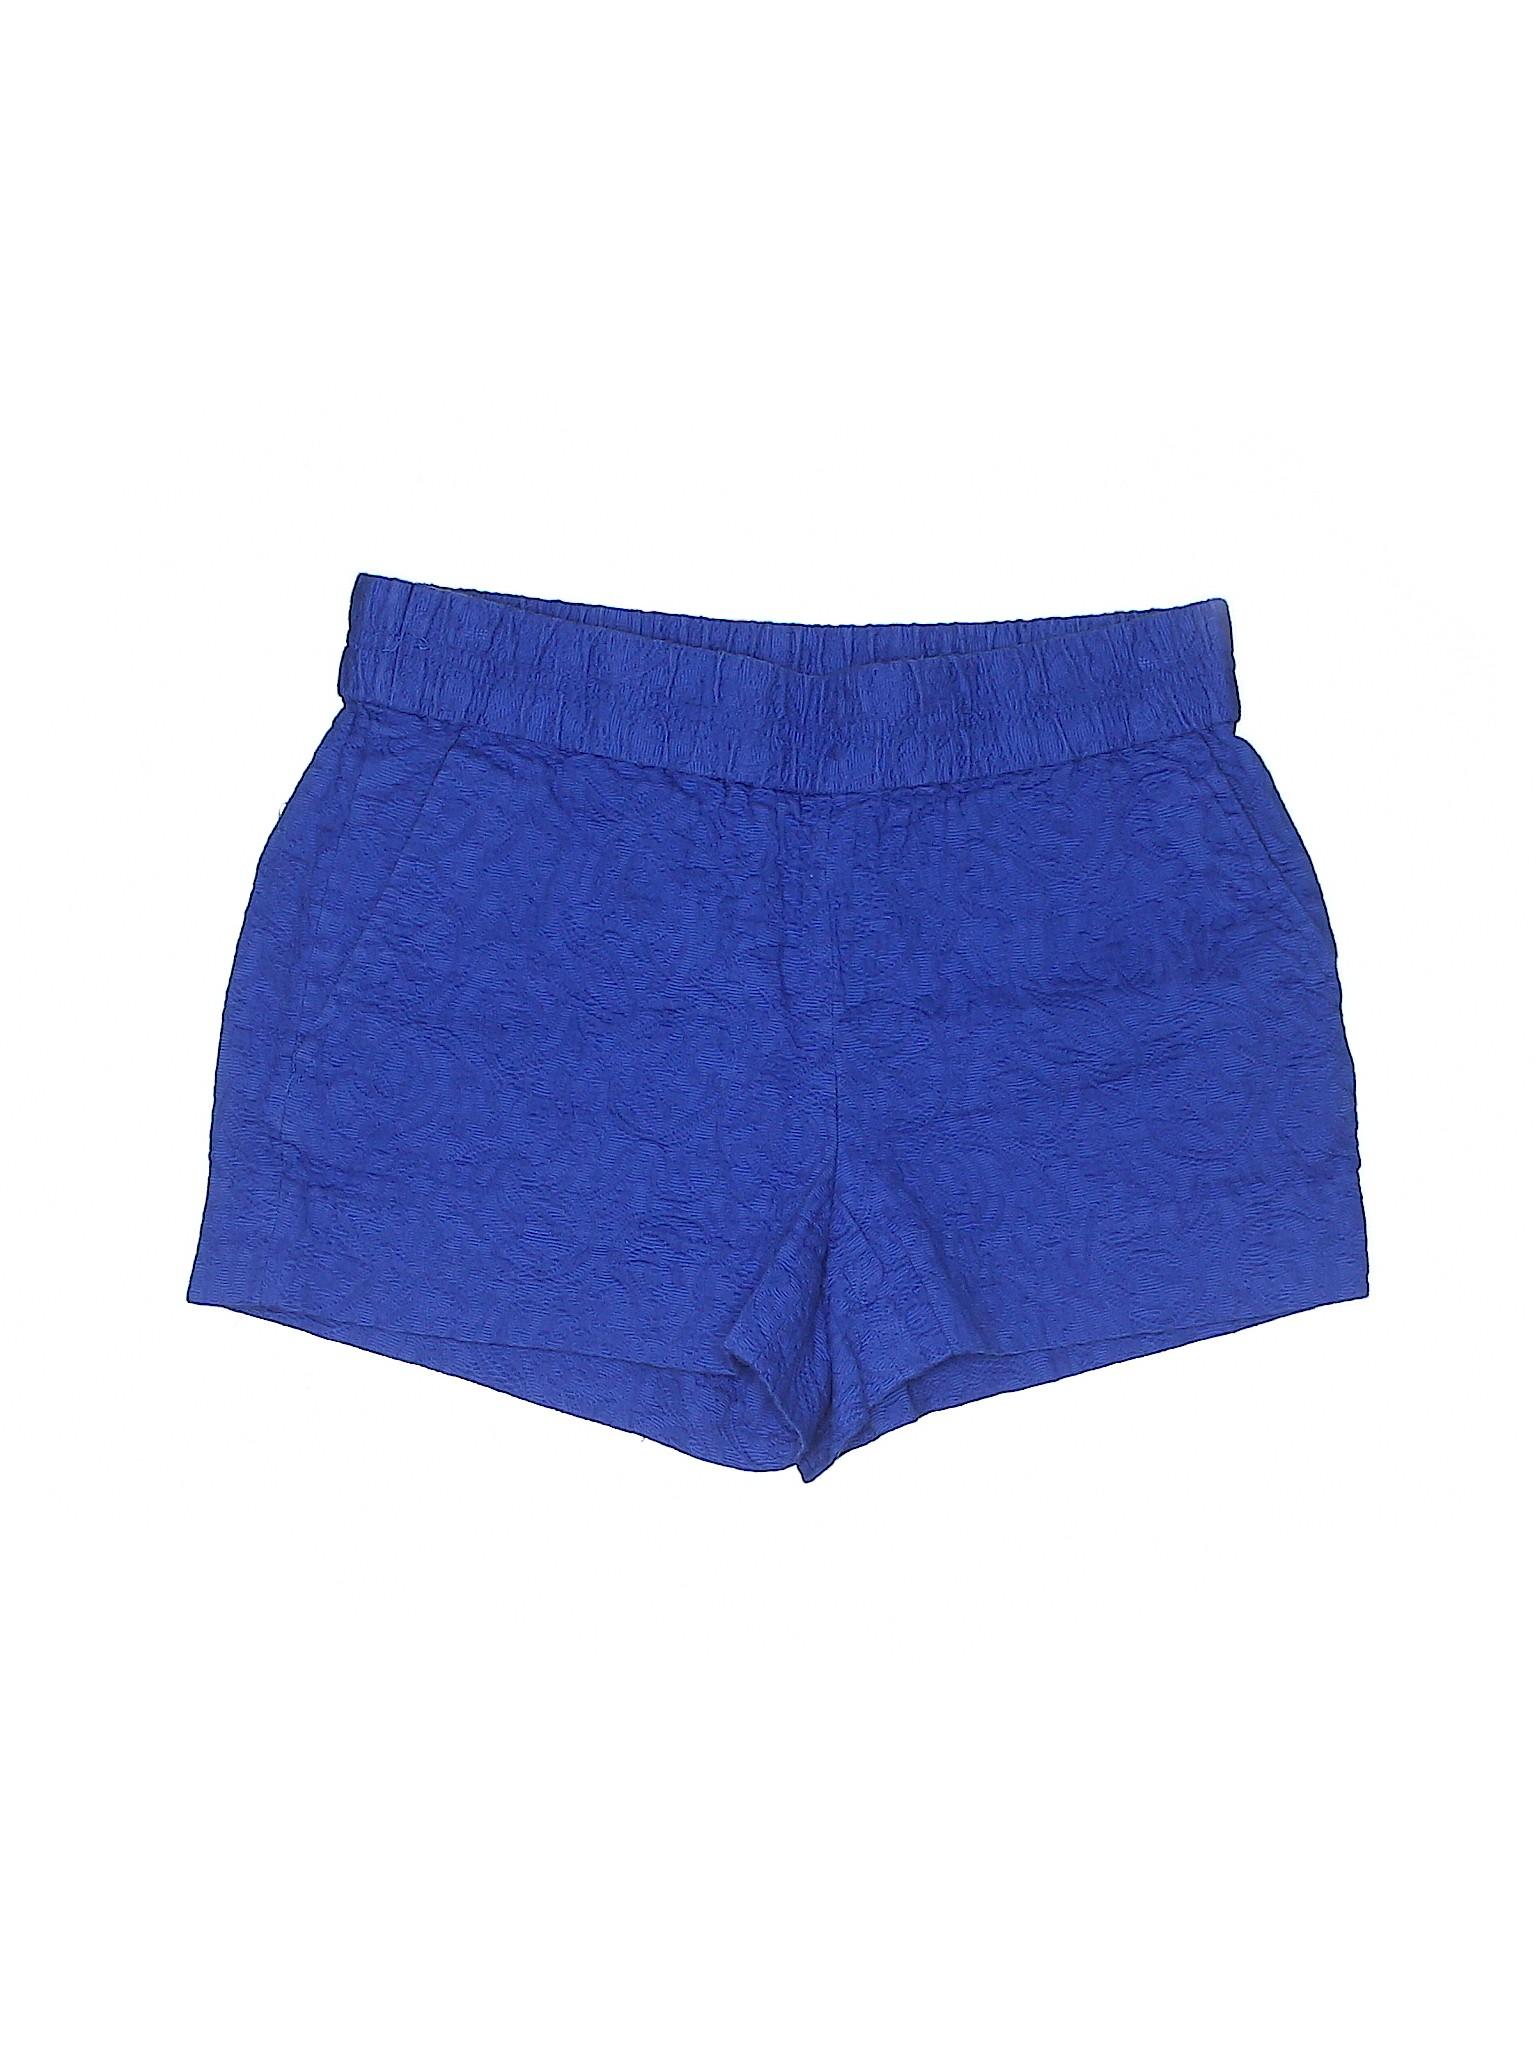 Crew leisure Shorts Crew Shorts leisure J Boutique leisure Boutique Shorts Crew J Boutique J Enq6Unpv